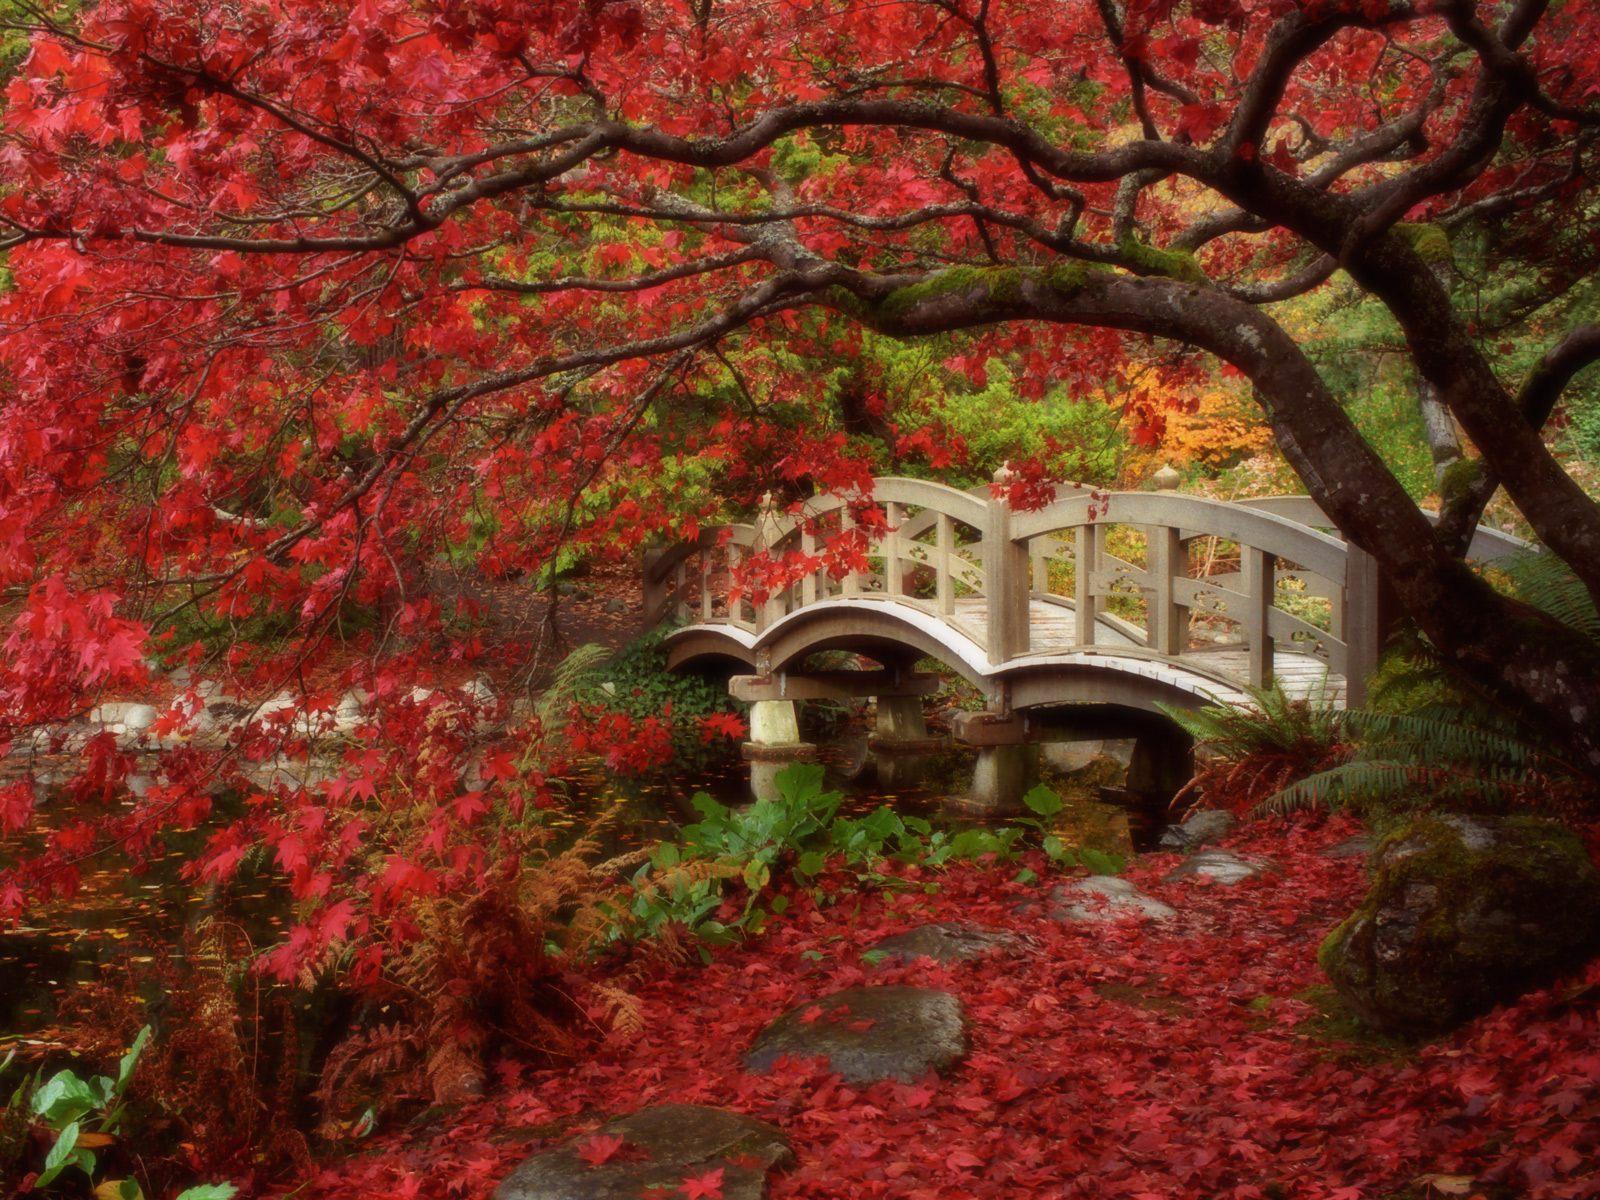 Japanese Garden British Columbia Wallpapers HD 1600x1200